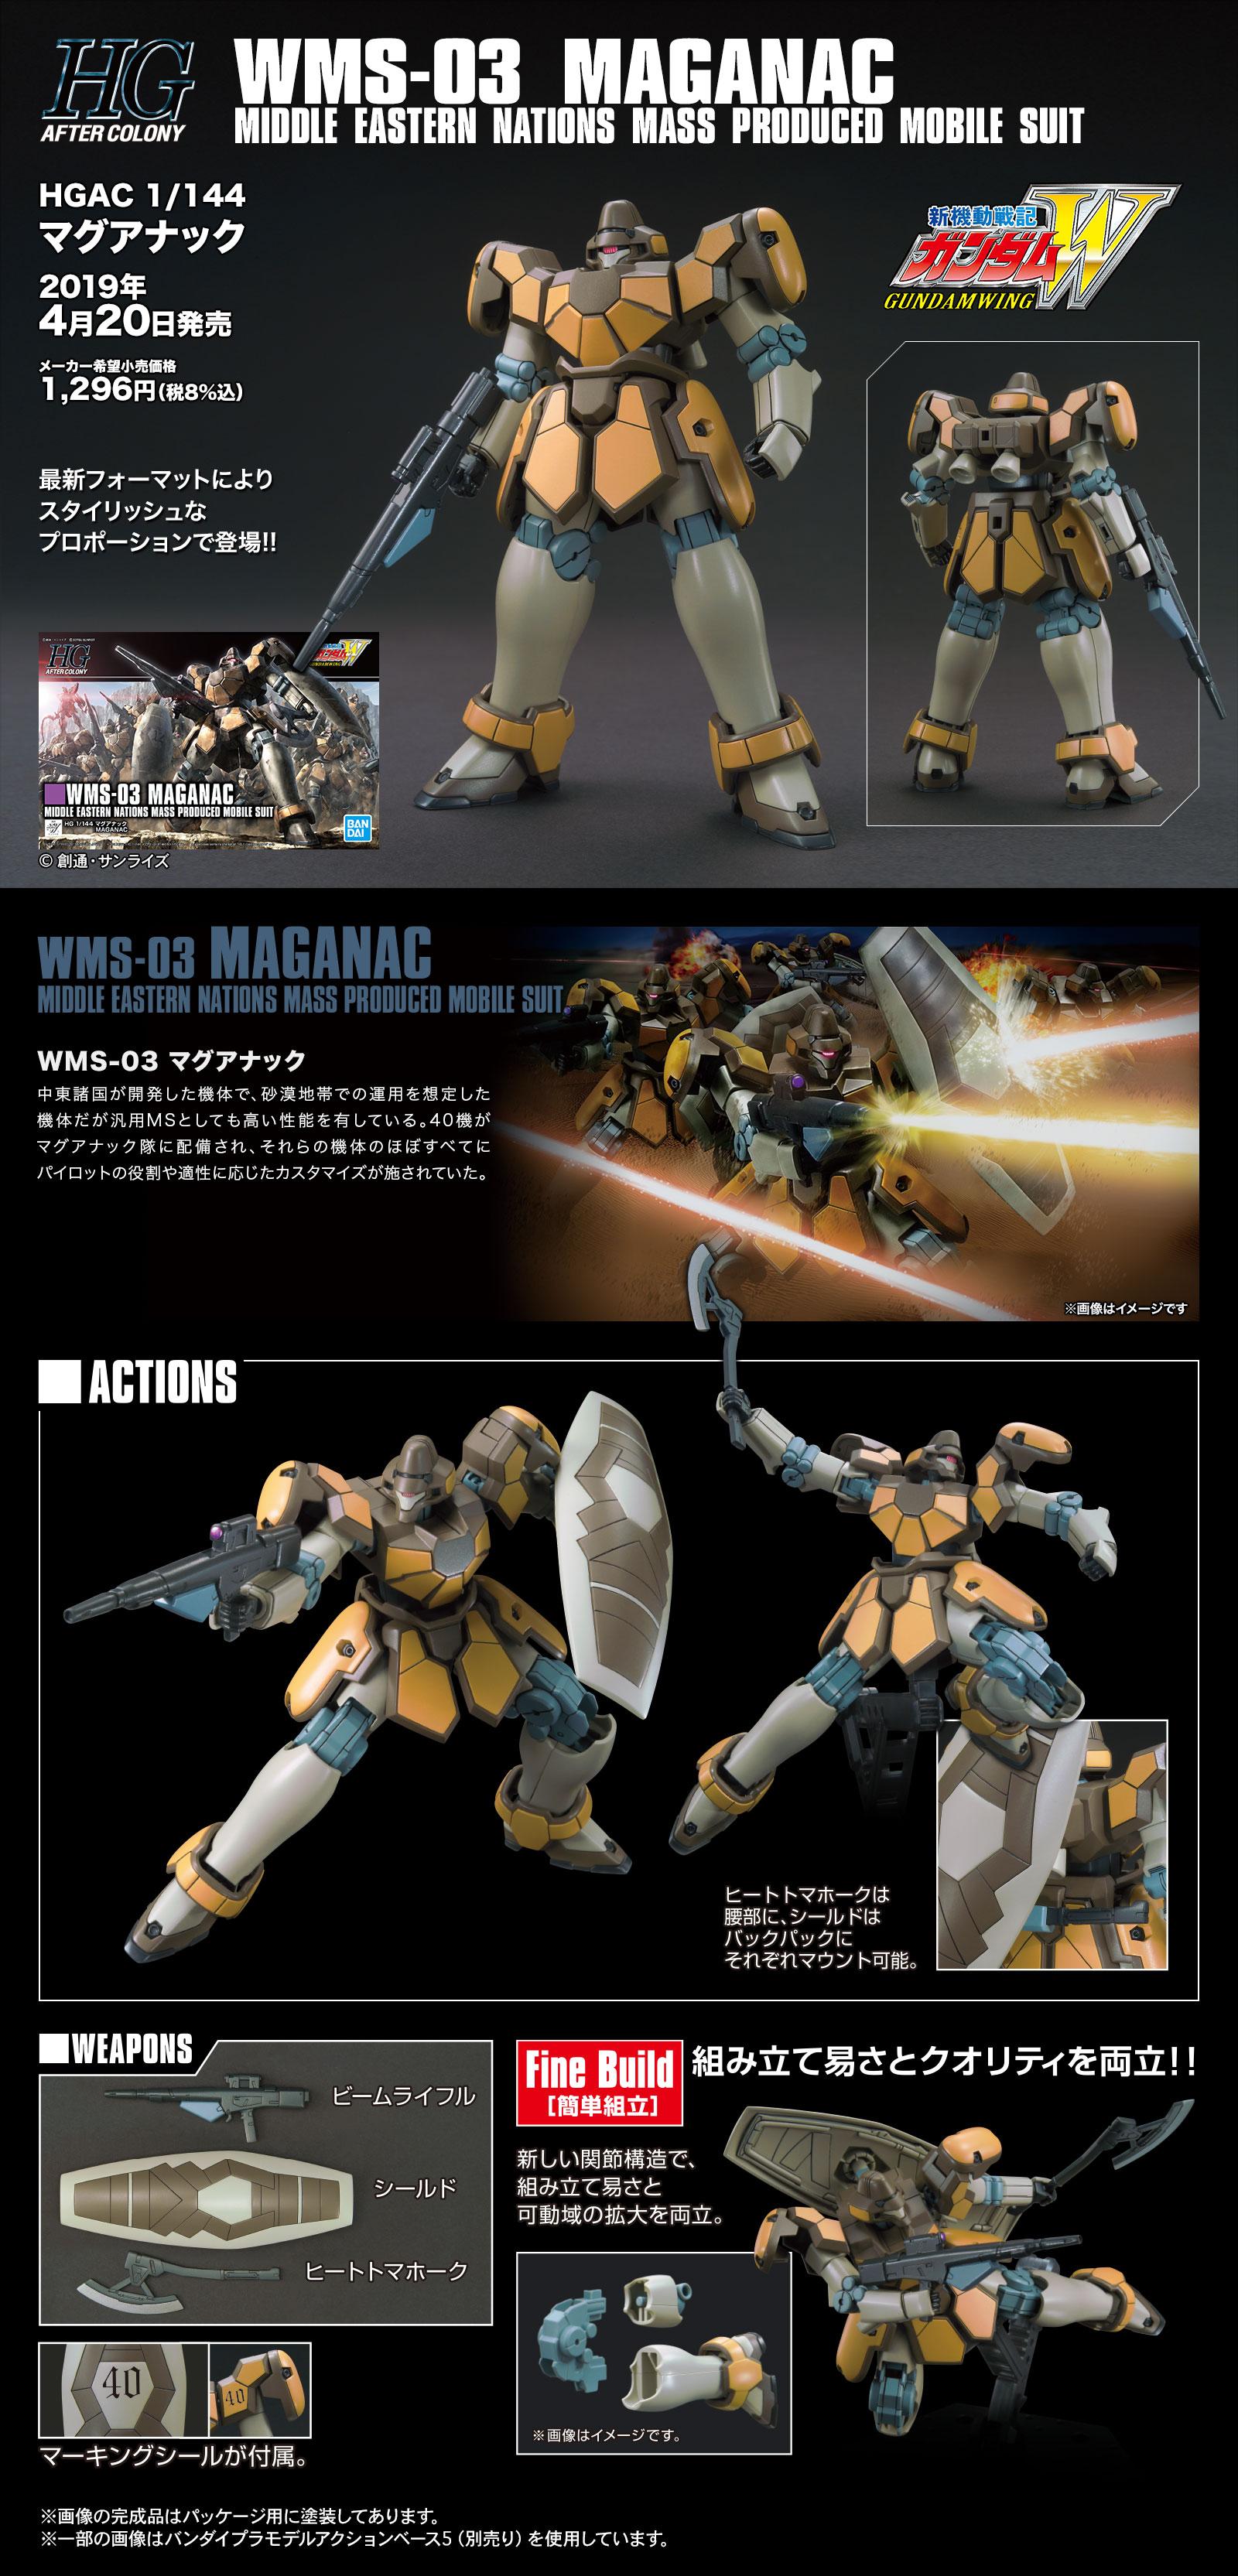 HGAC 1/144 WMS-03 マグアナック 公式商品説明(画像)